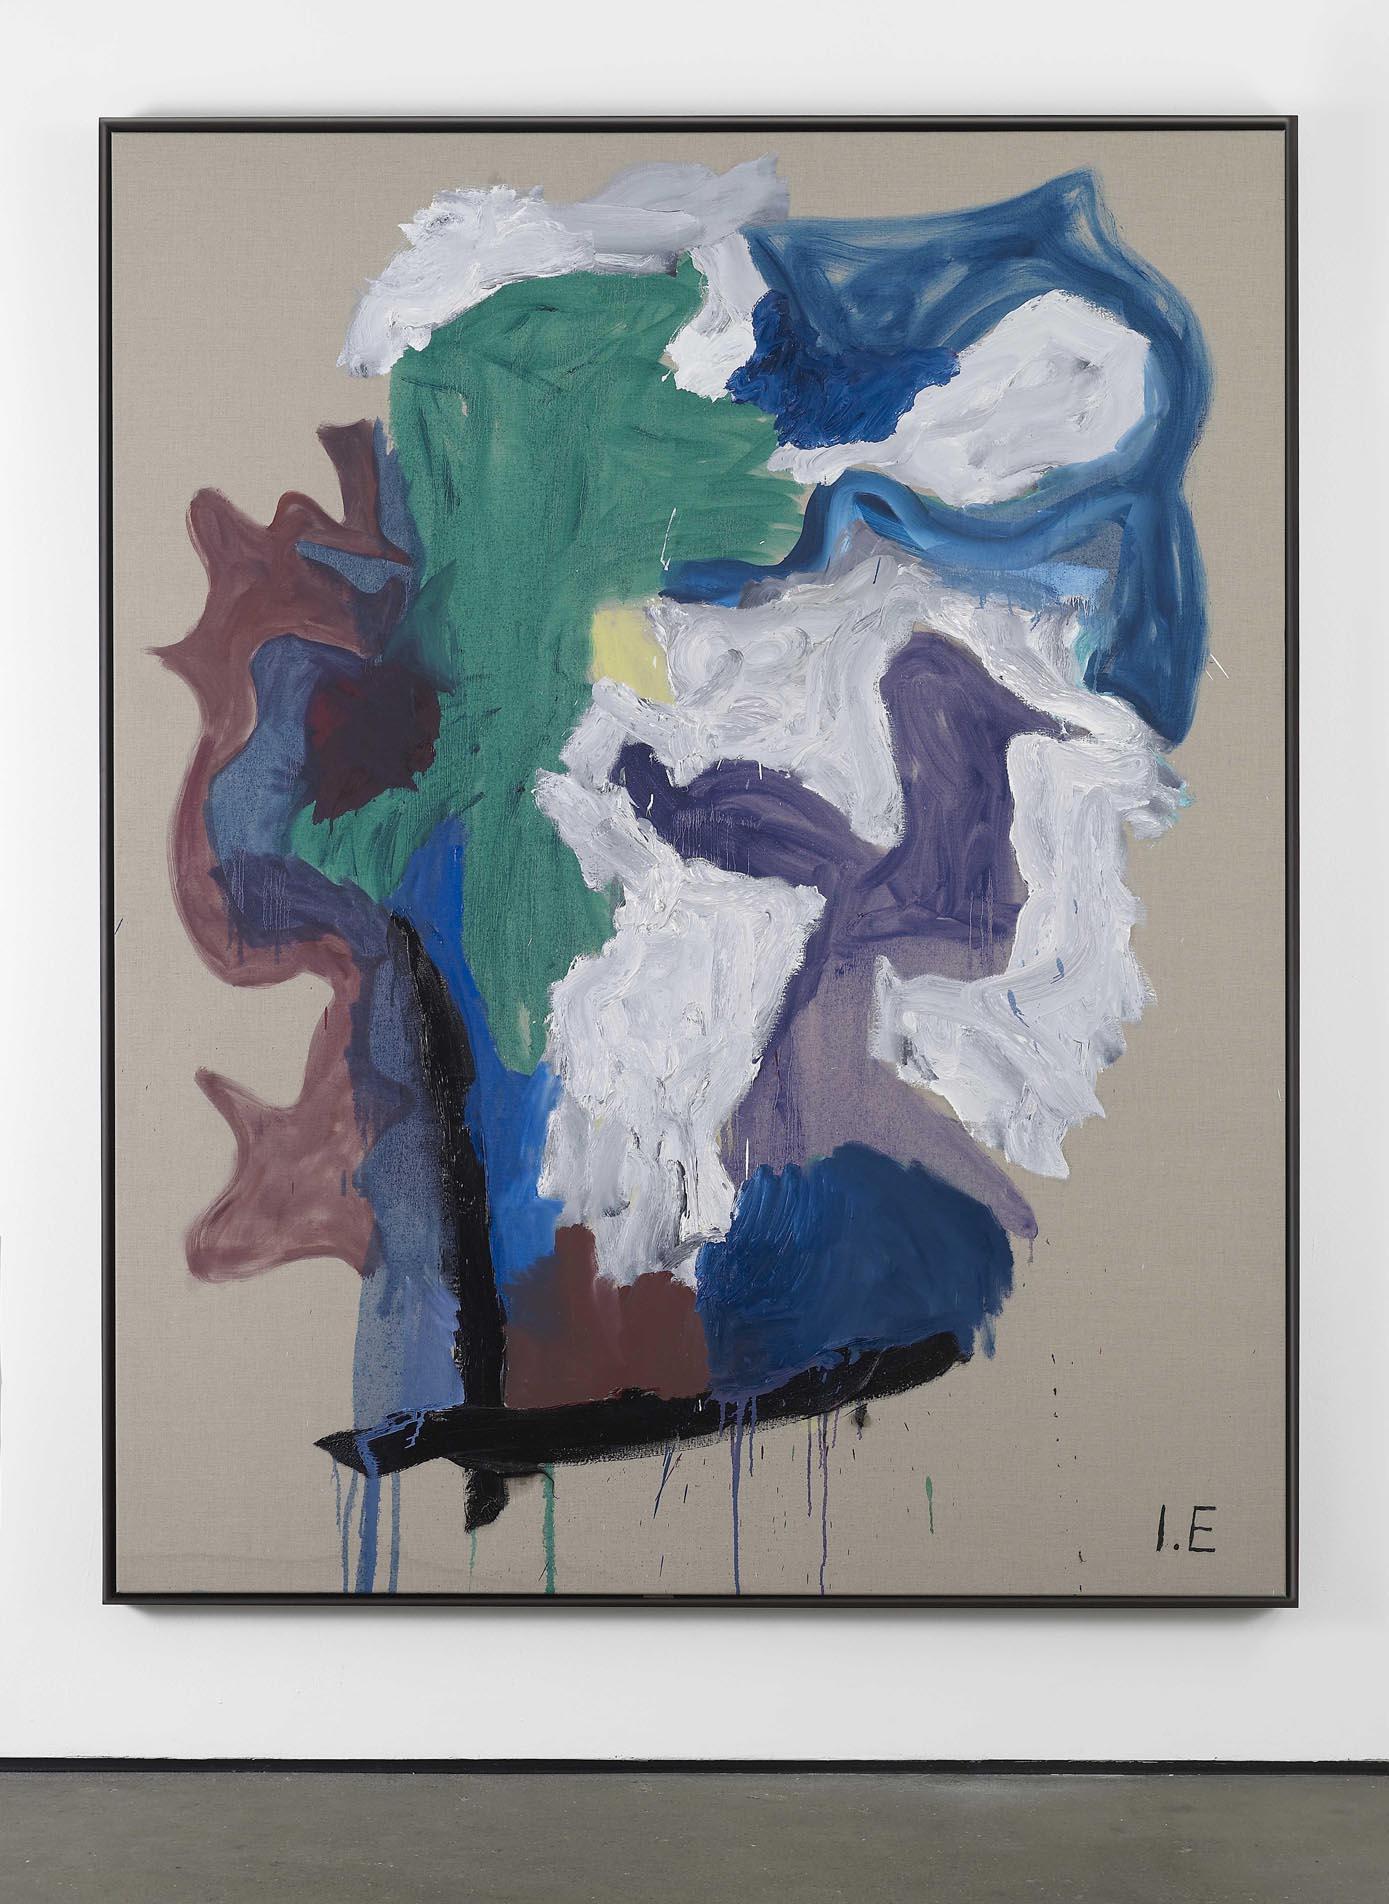 Grey Bonnet on a shelf 2010 Oil on linen, framed 203.5 x 163.5 cm / 80.1 x 64.3 in